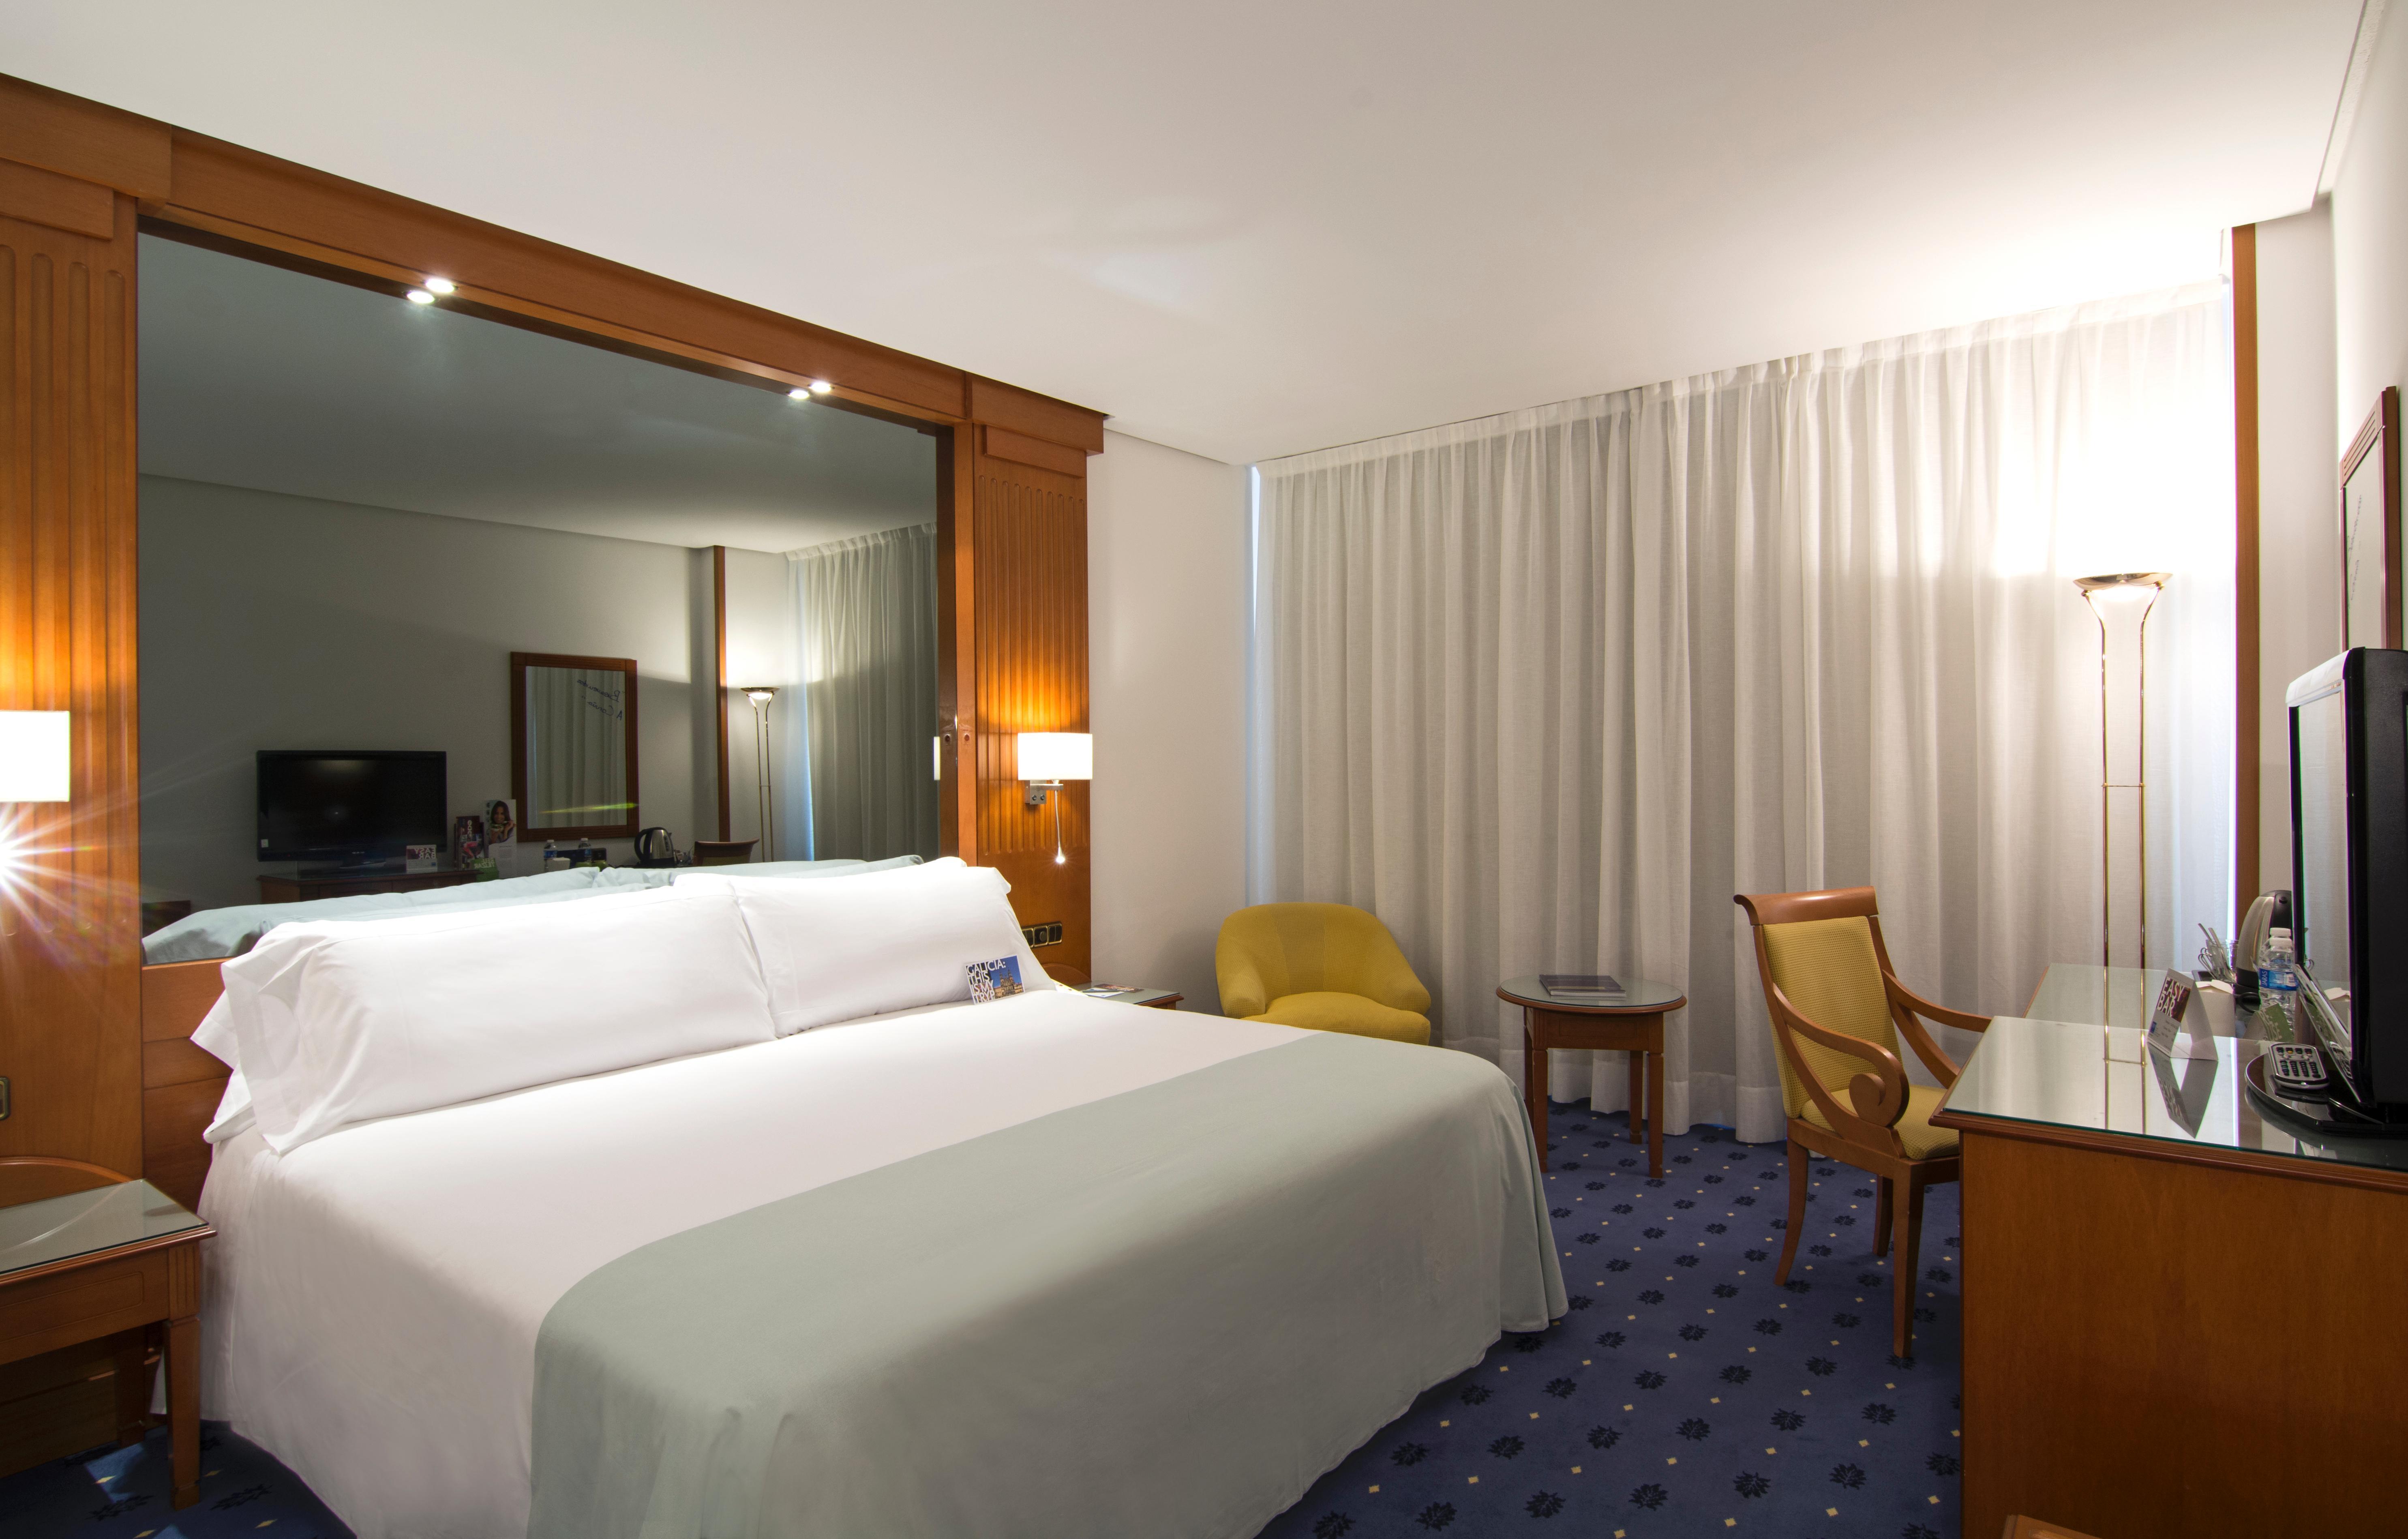 2. Tryp Coruña Hotel